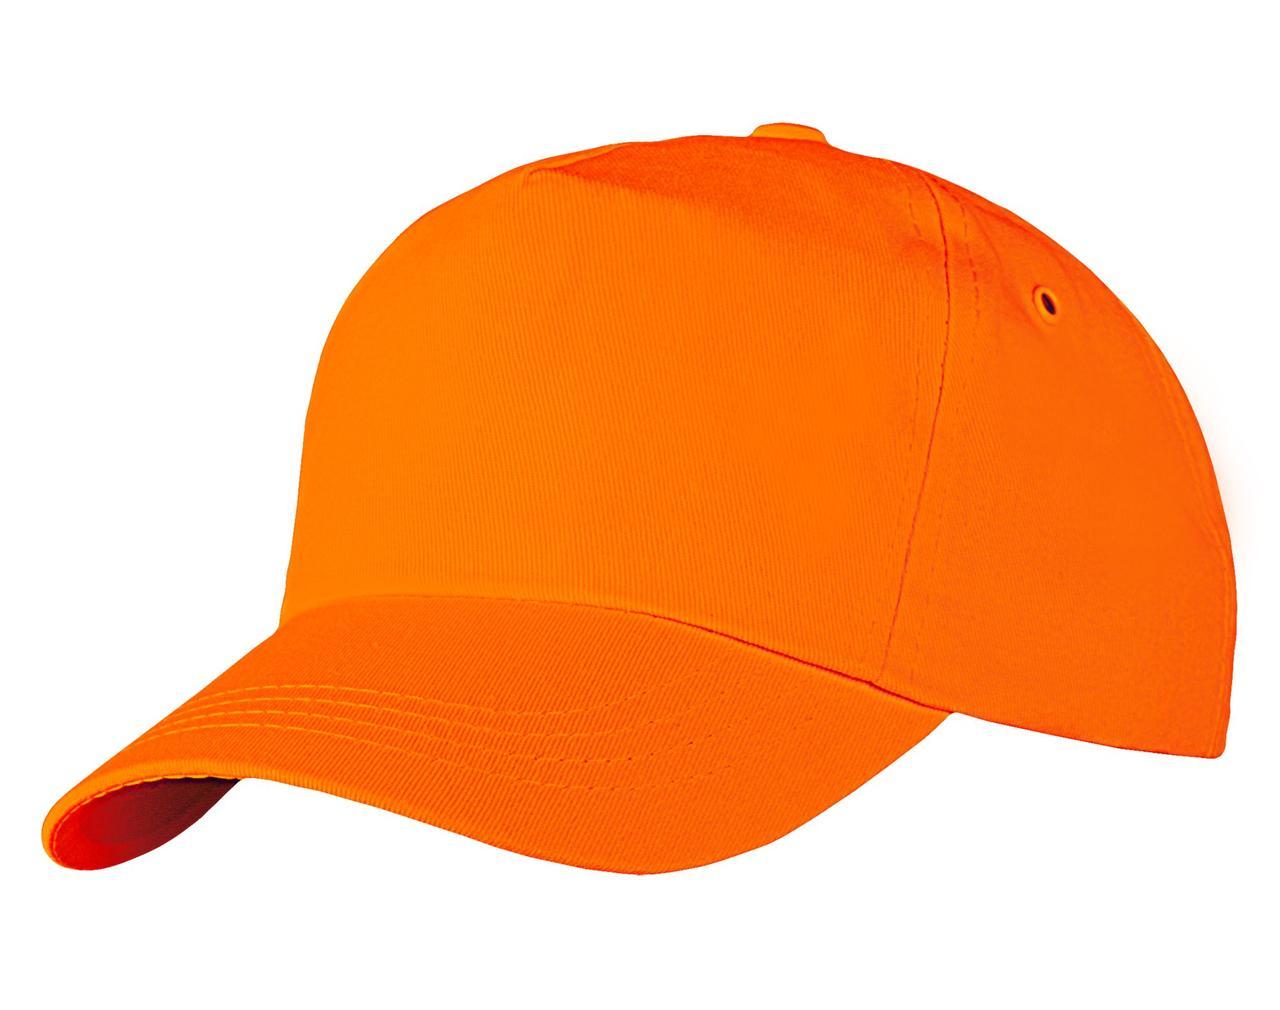 Бейсболка Unit Promo, оранжевая (артикул 1846.20)